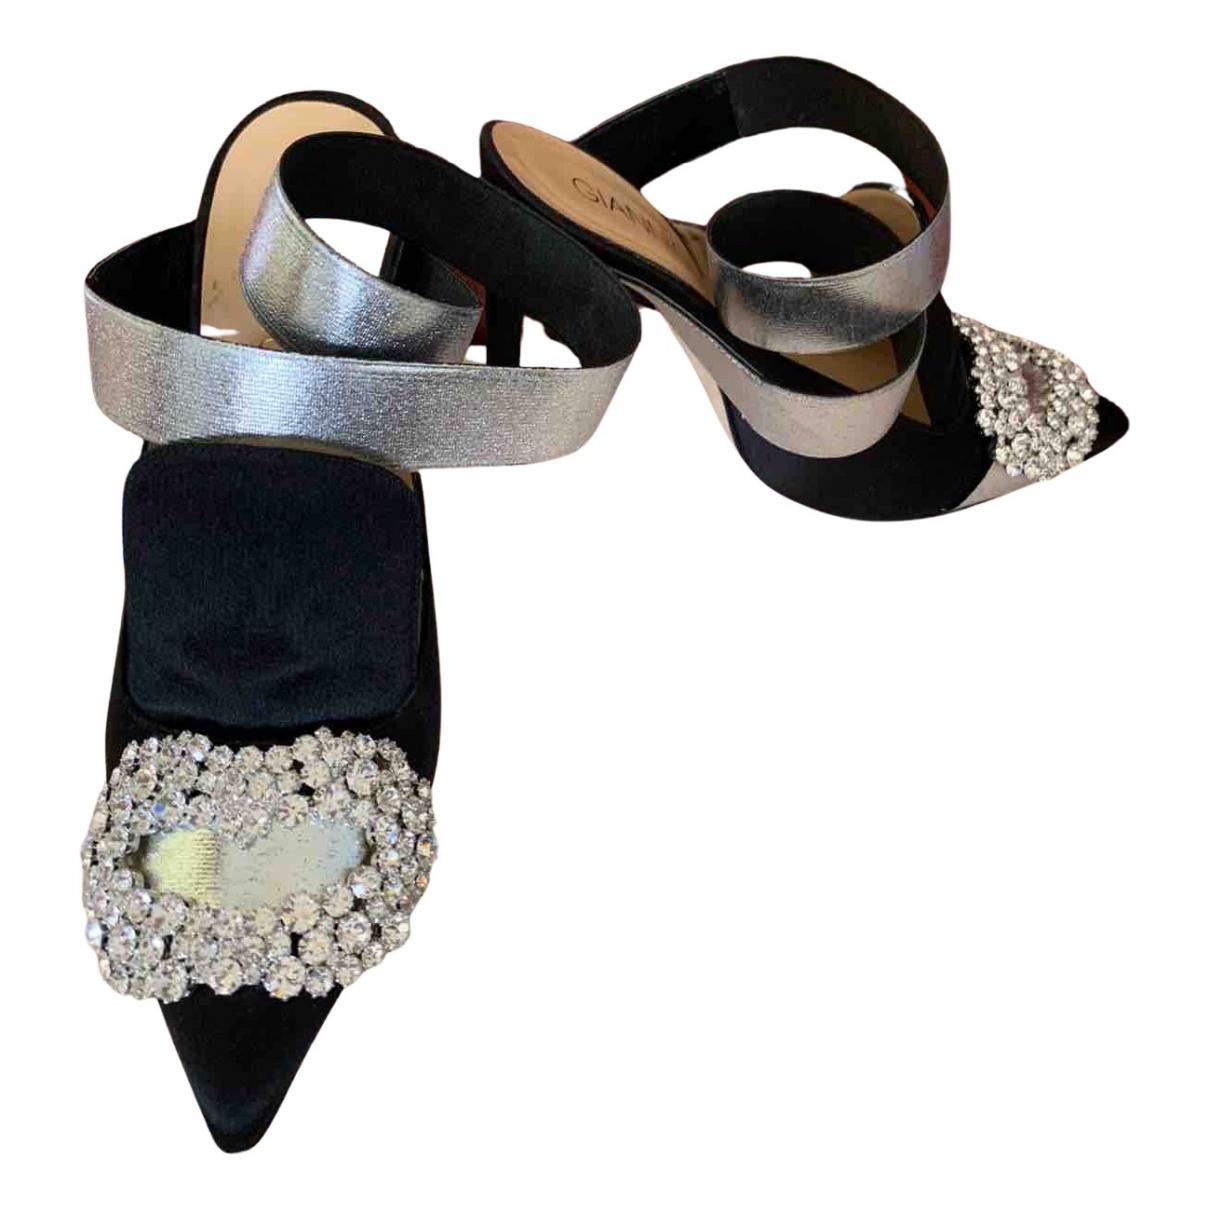 Giannico N Black Leather Heels for Women 37 EU